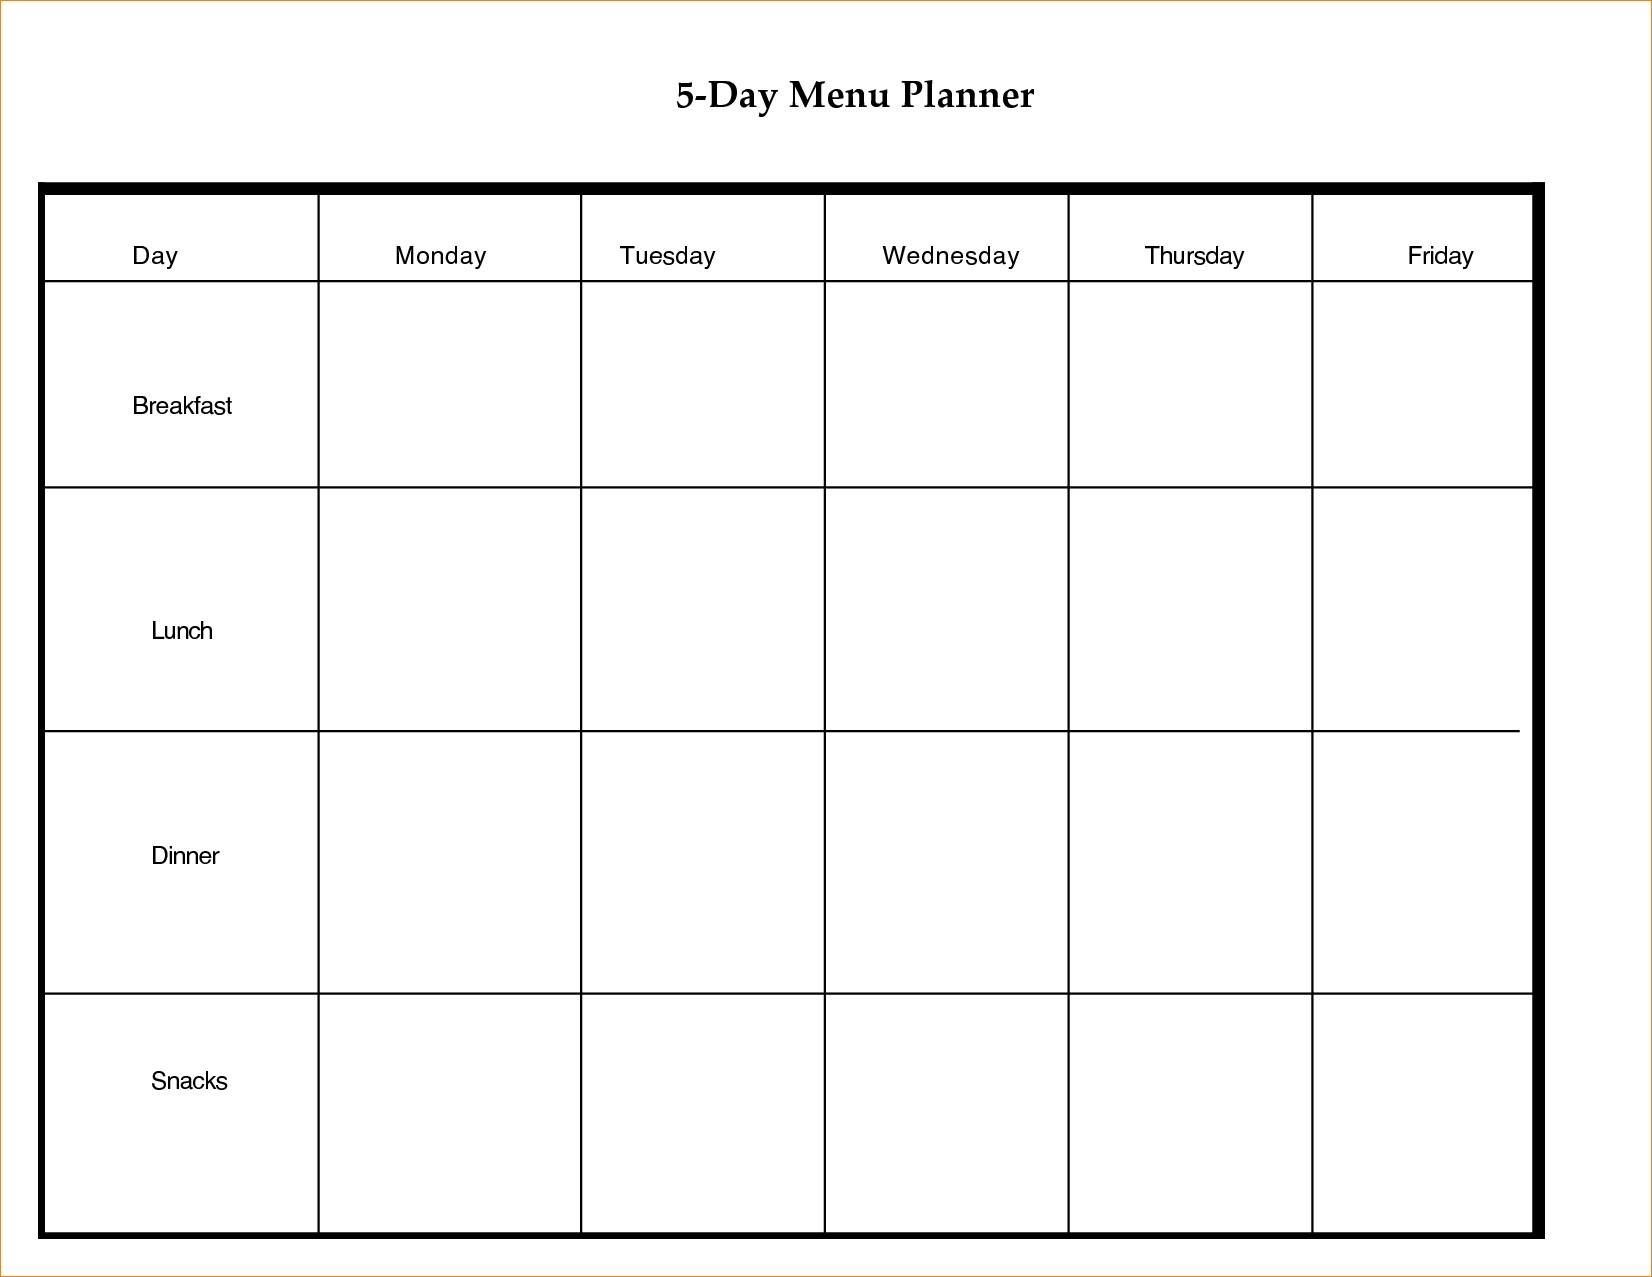 Printable 5 Day Calendar Blank Calendar Template 5 Day Week 0 8 With within Printable 5 Day Monthly Calendar